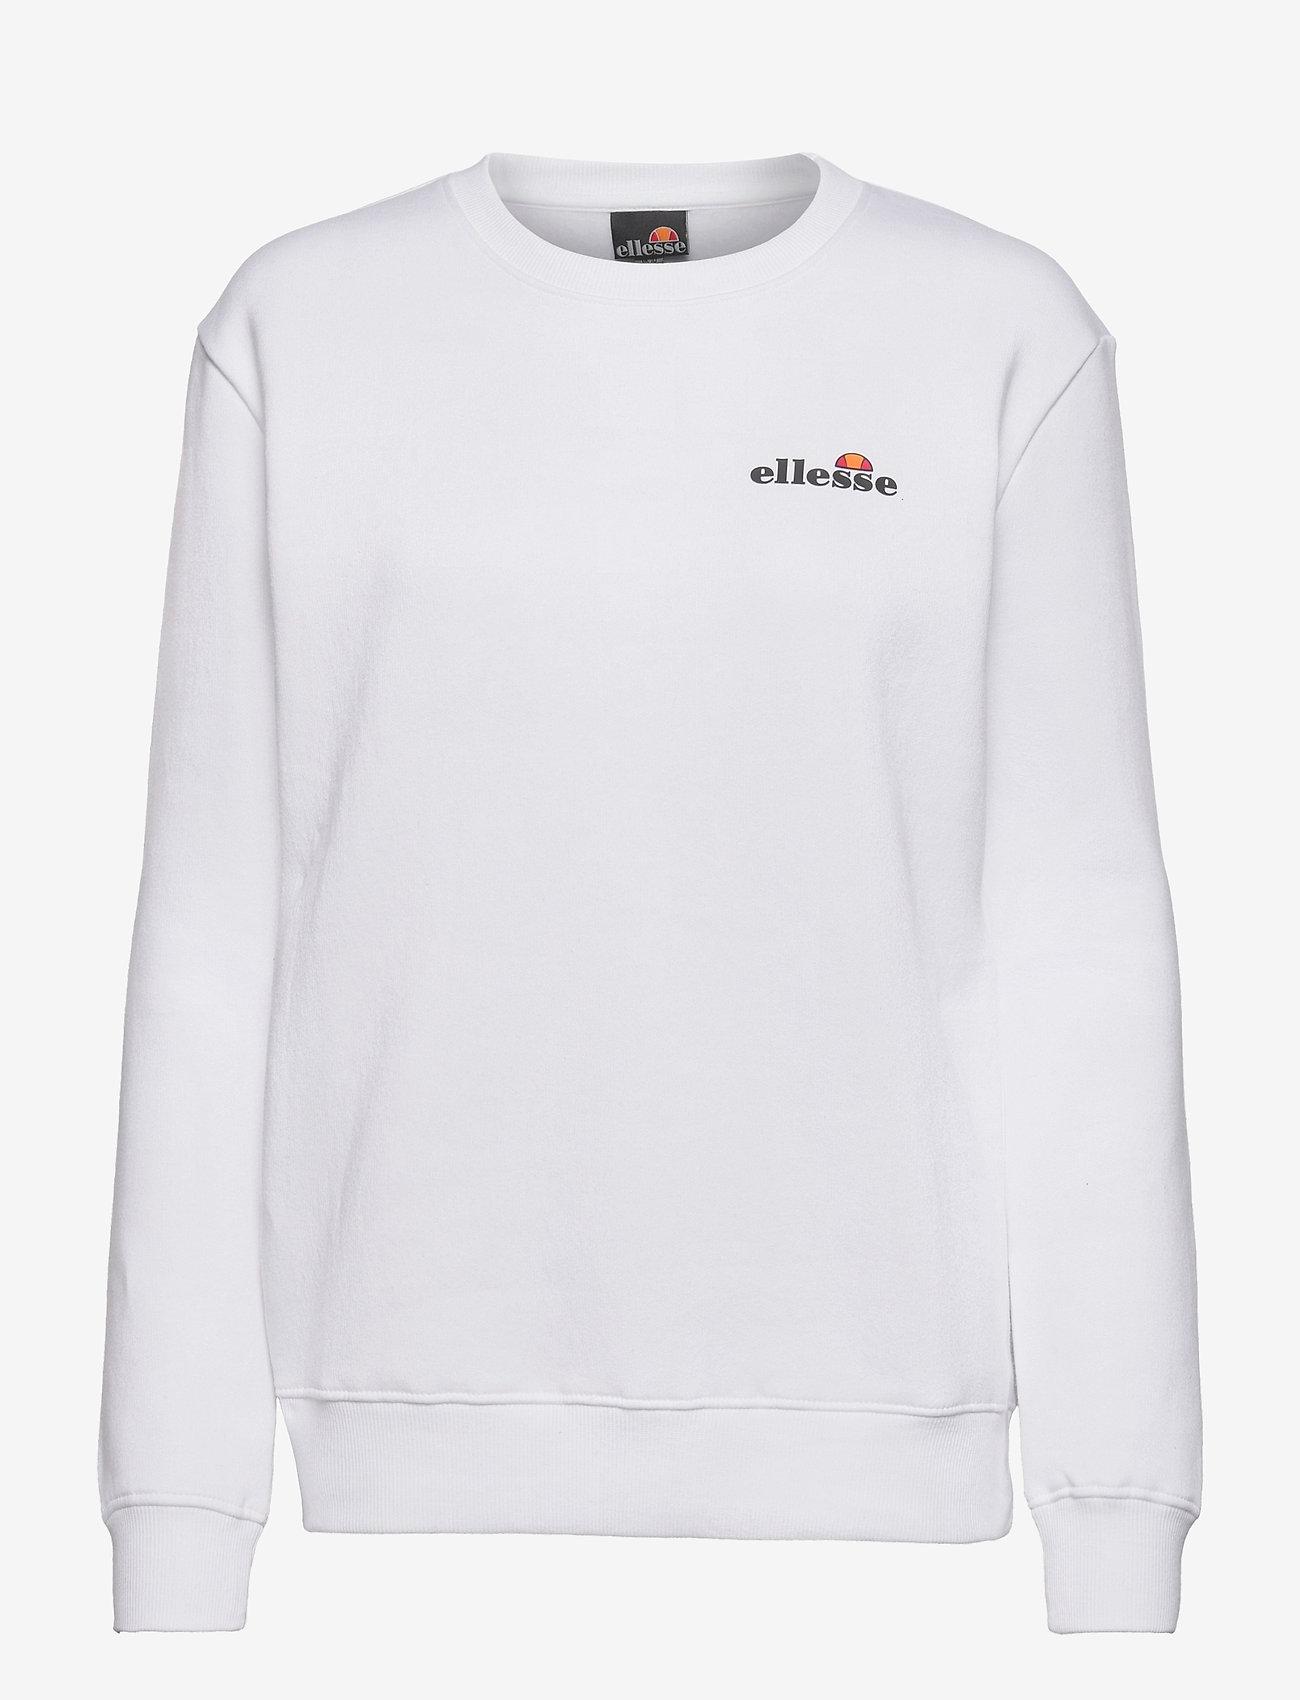 Ellesse - EL ARVELLO SWEATSHIRT - sale - white - 0